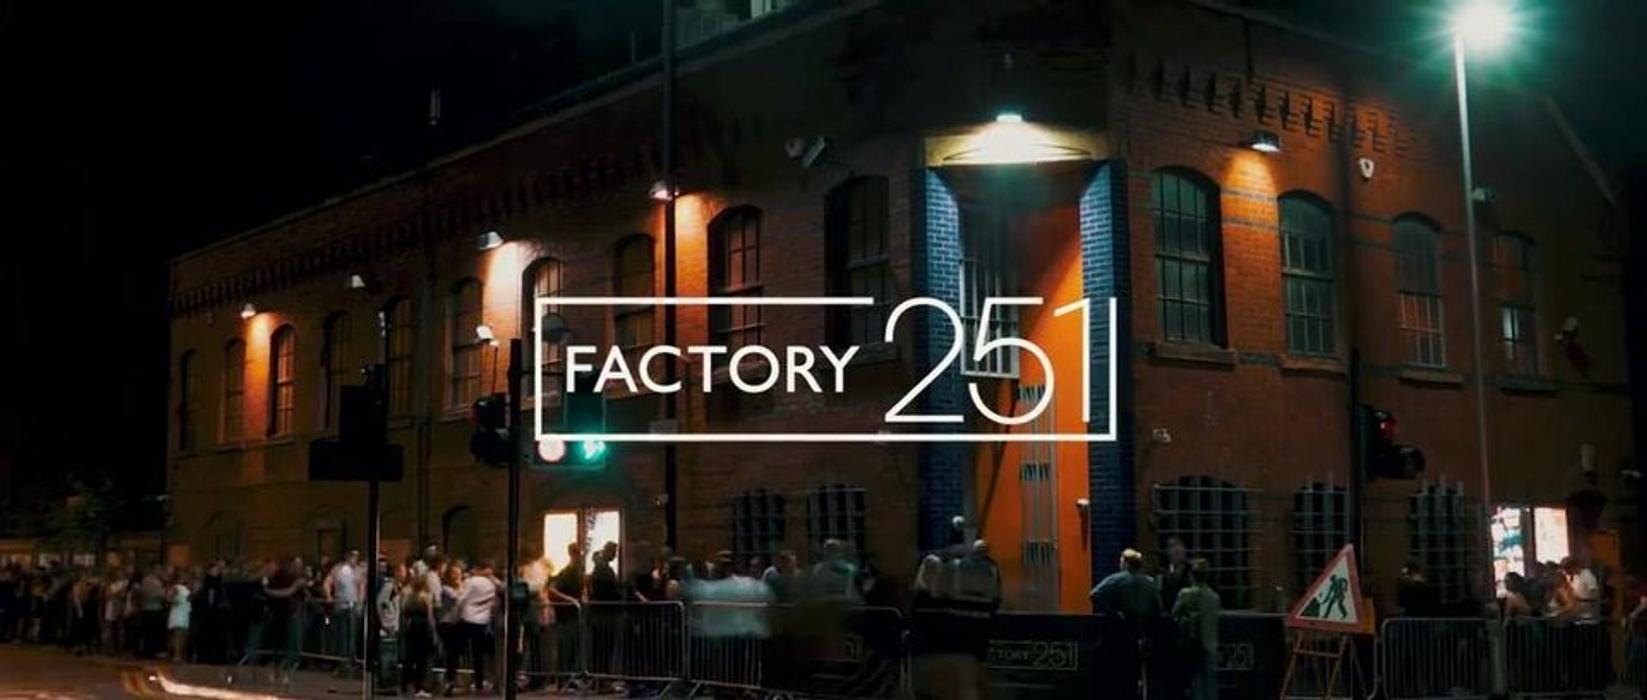 Factory 251